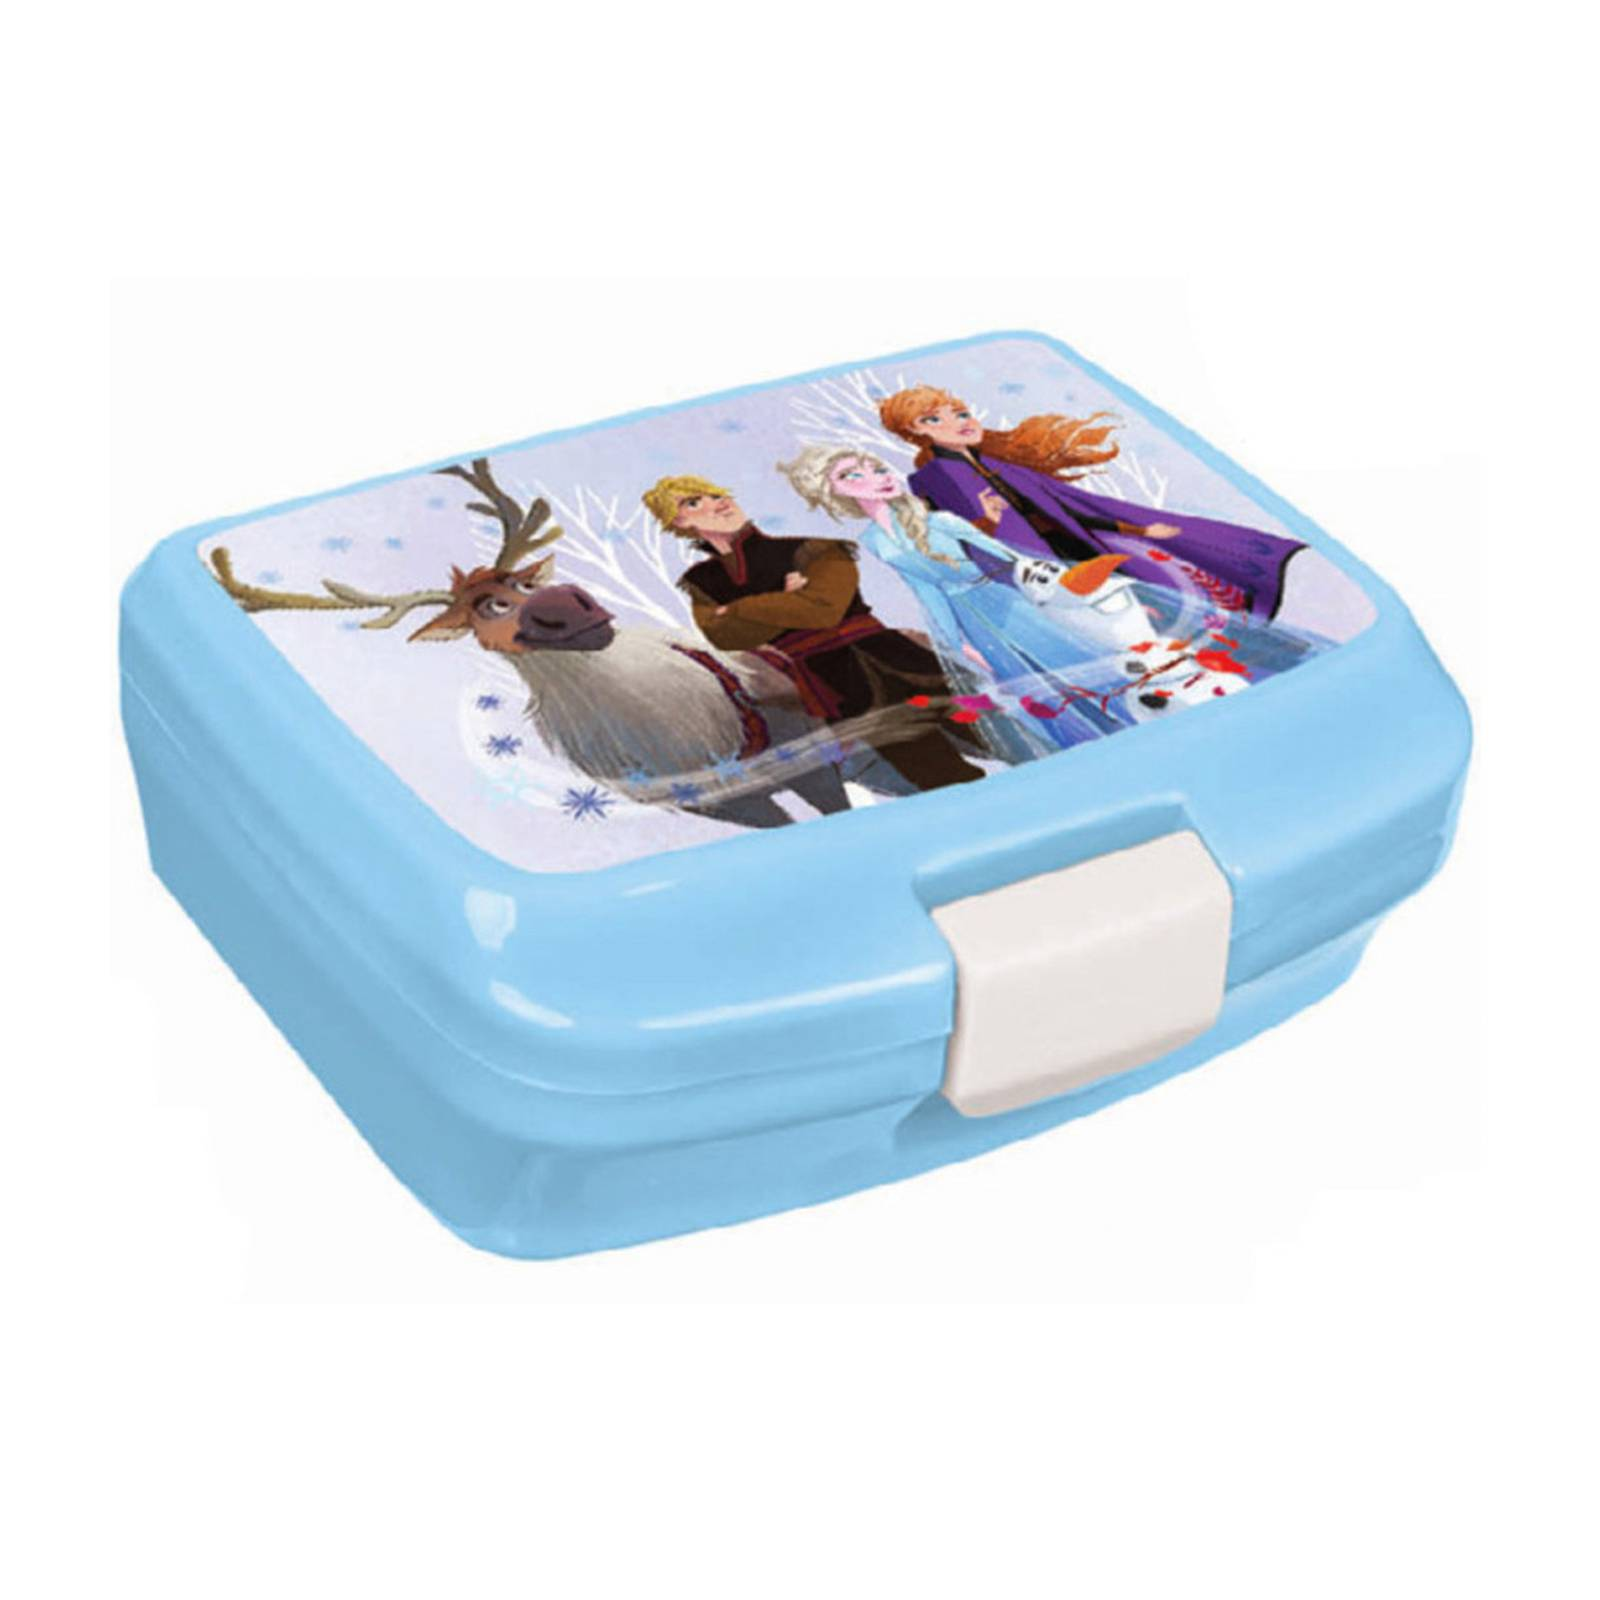 Lunchbox Frozen II Trek Blue 17 x 12,2 cm DISNEY